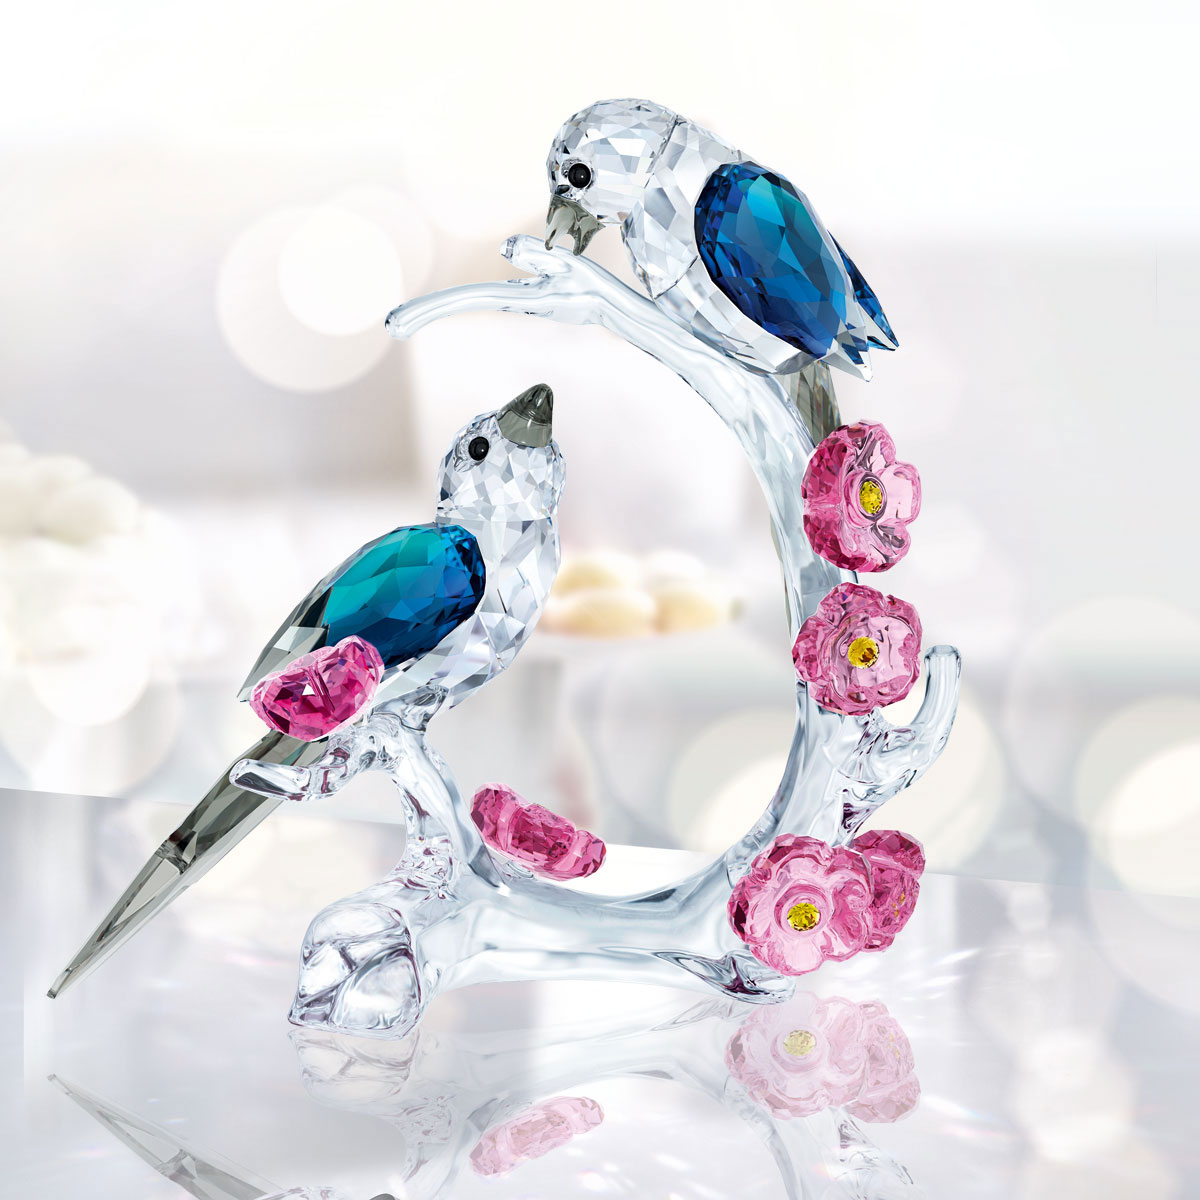 Swarovski Crystal Paradise Magpies Sculpture